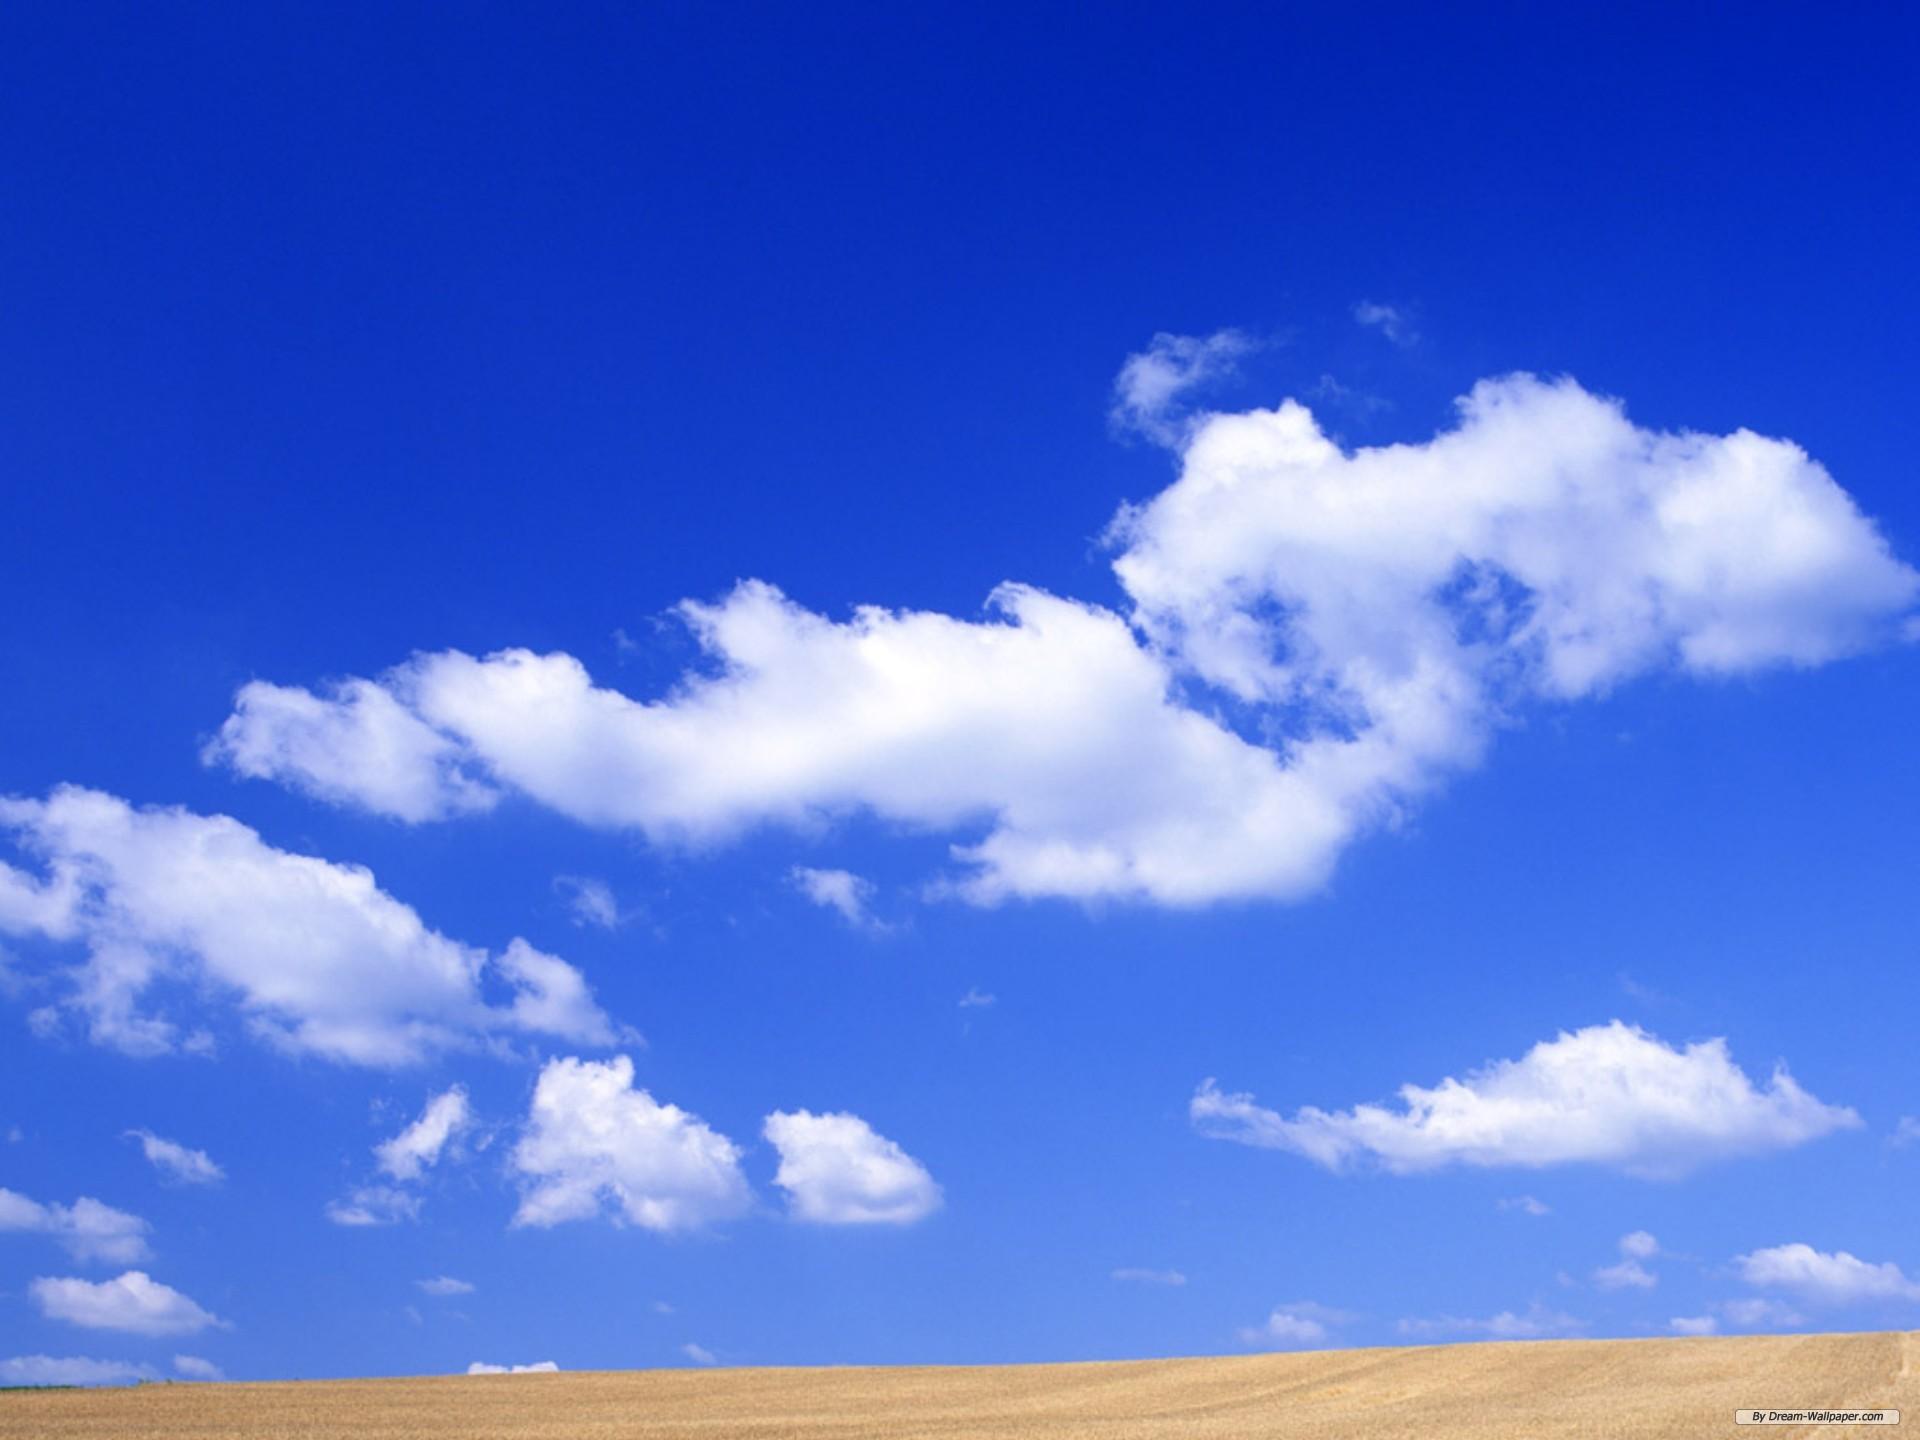 wallpaper   Blue Sky And White Cloud 2 wallpaper   1920x1440 wallpaper 1920x1440